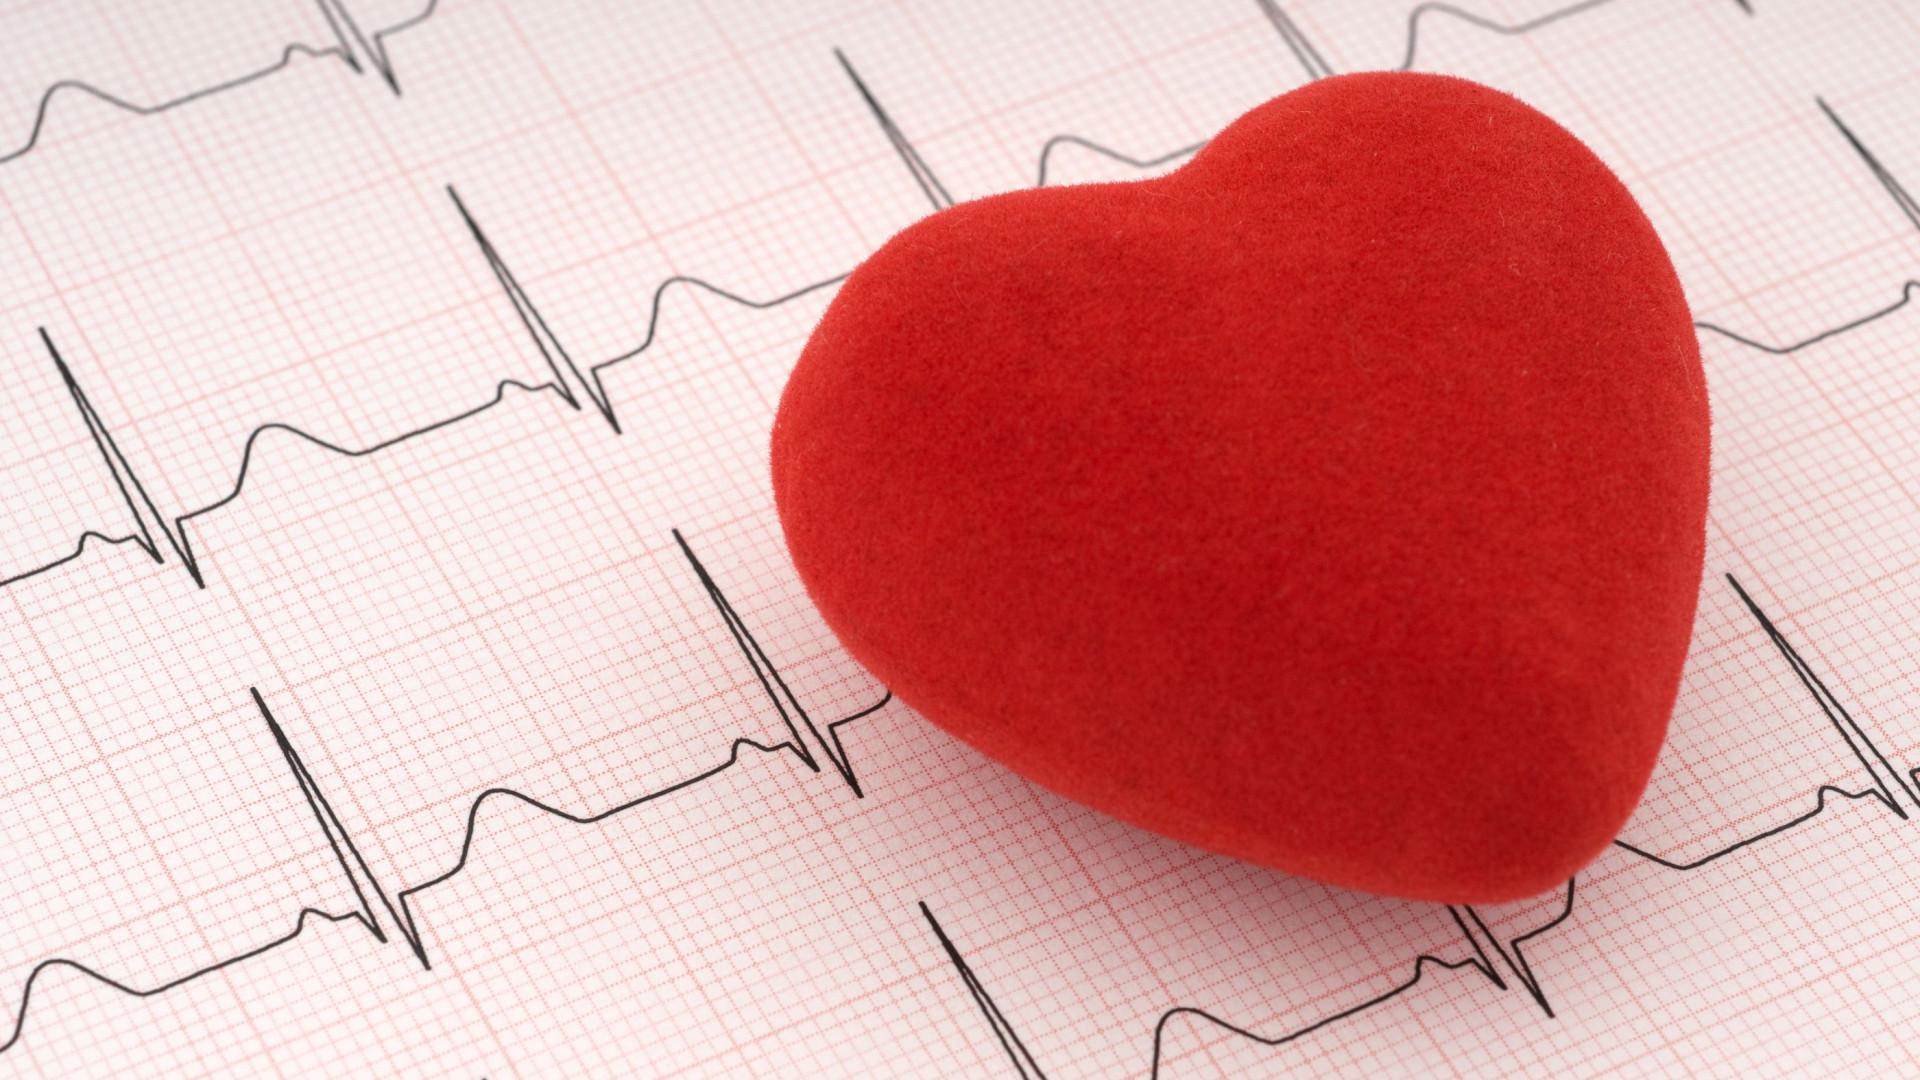 causas colesterol alto sintomas